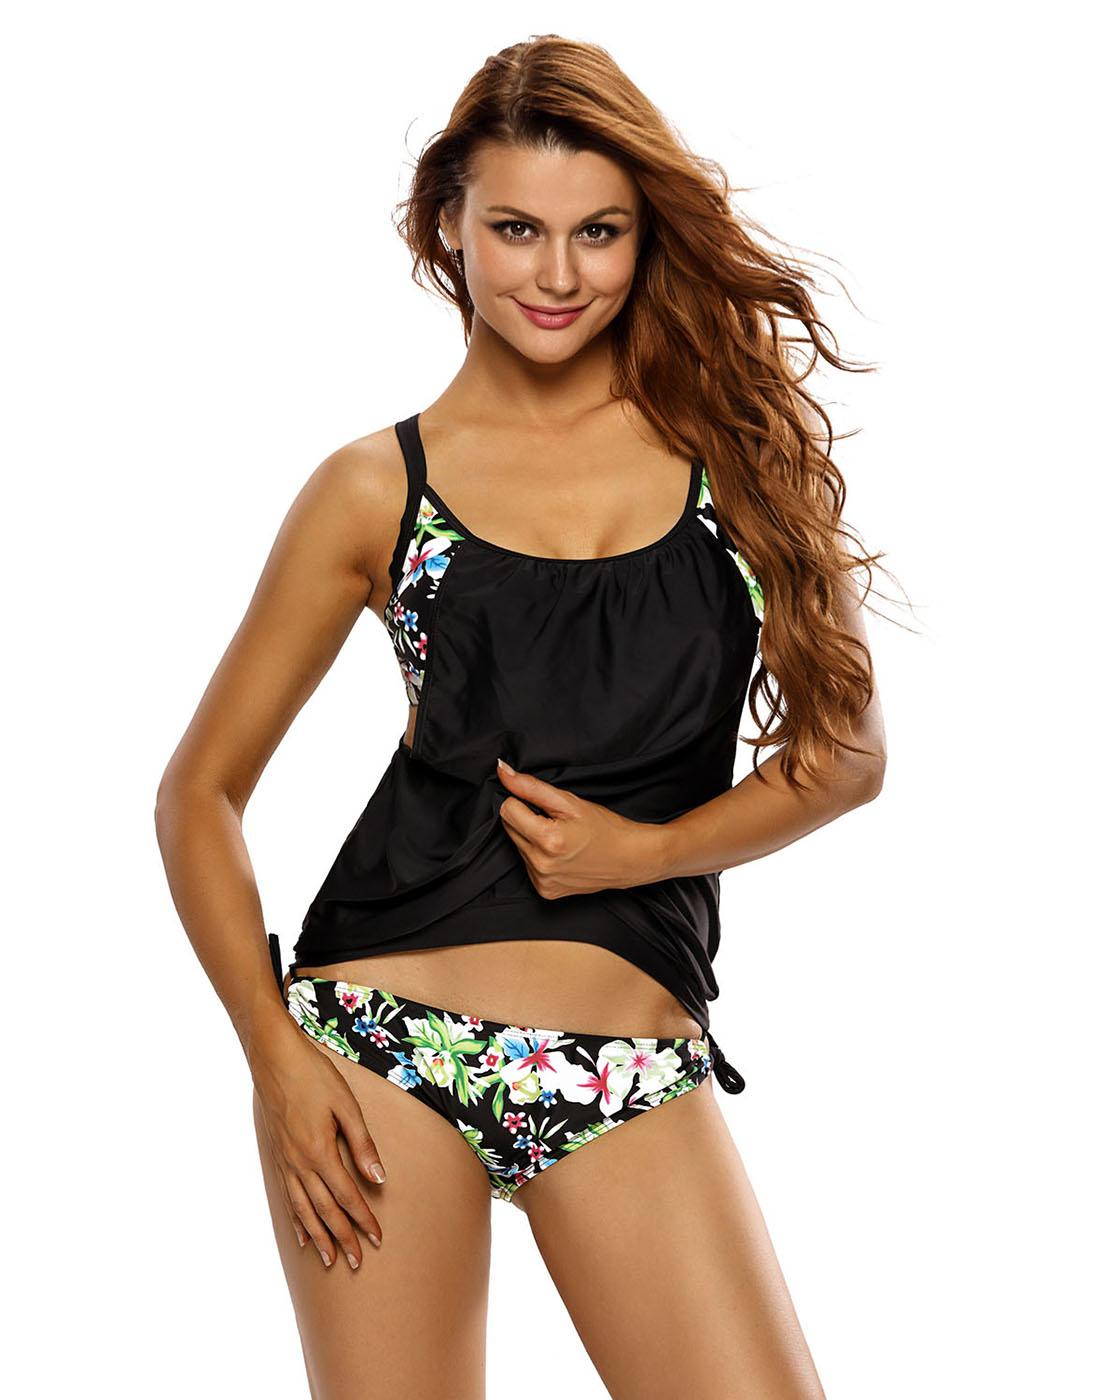 HDE Women's Push Up Tankini Black Floral Bathing Suit 2 Piece Hawaiian Swimsuit by HDE